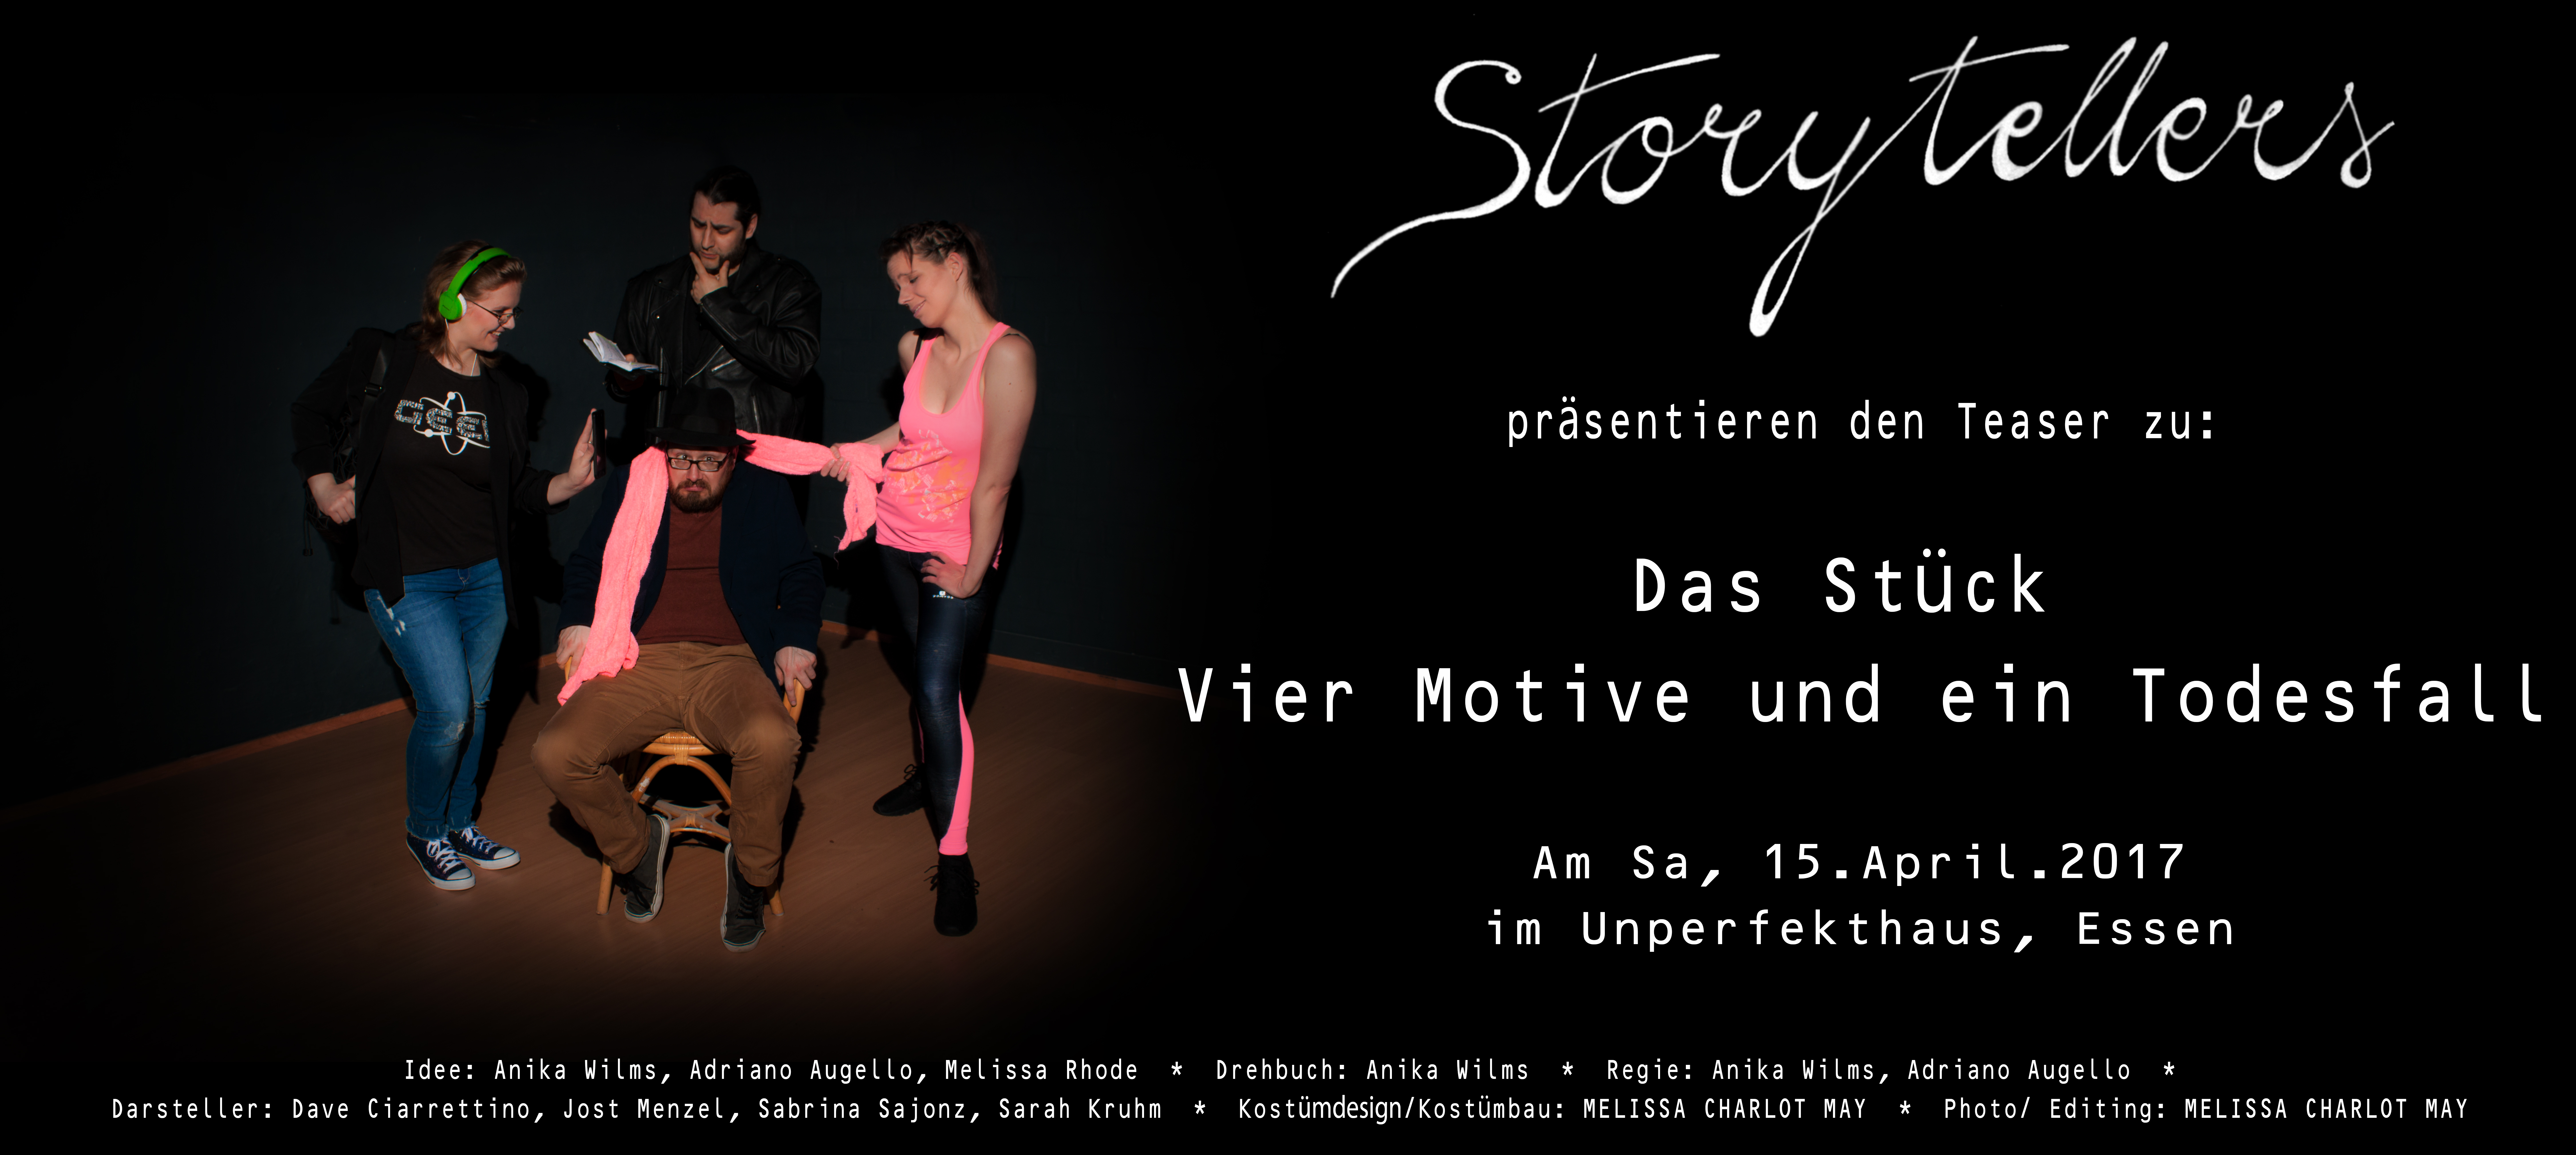 Storytellers - Plakat - quer - Sa, 15.April.2017